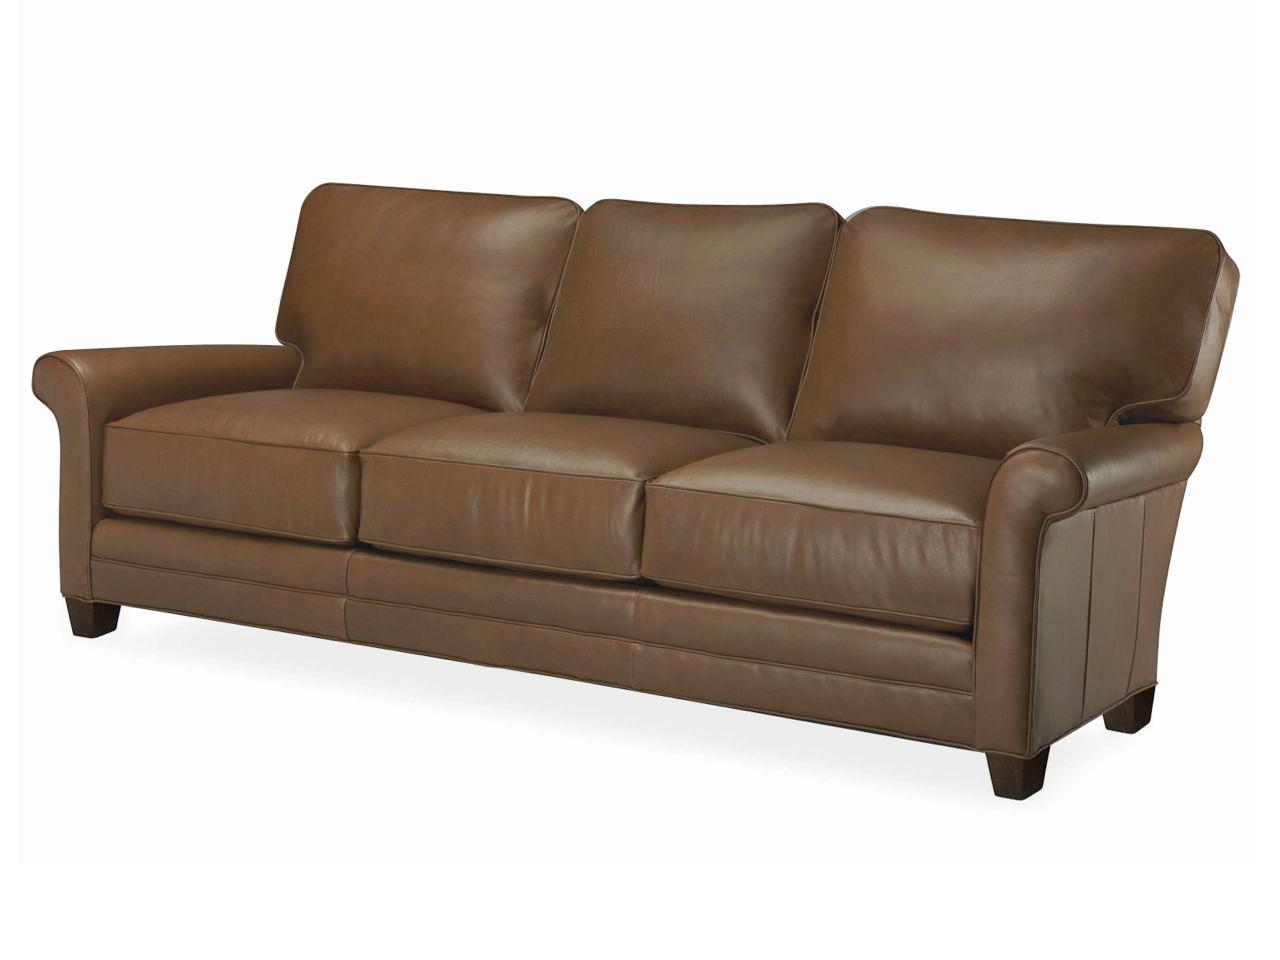 Verne Leather Queen Sleeper Leather Sleeper Sofas Sofa